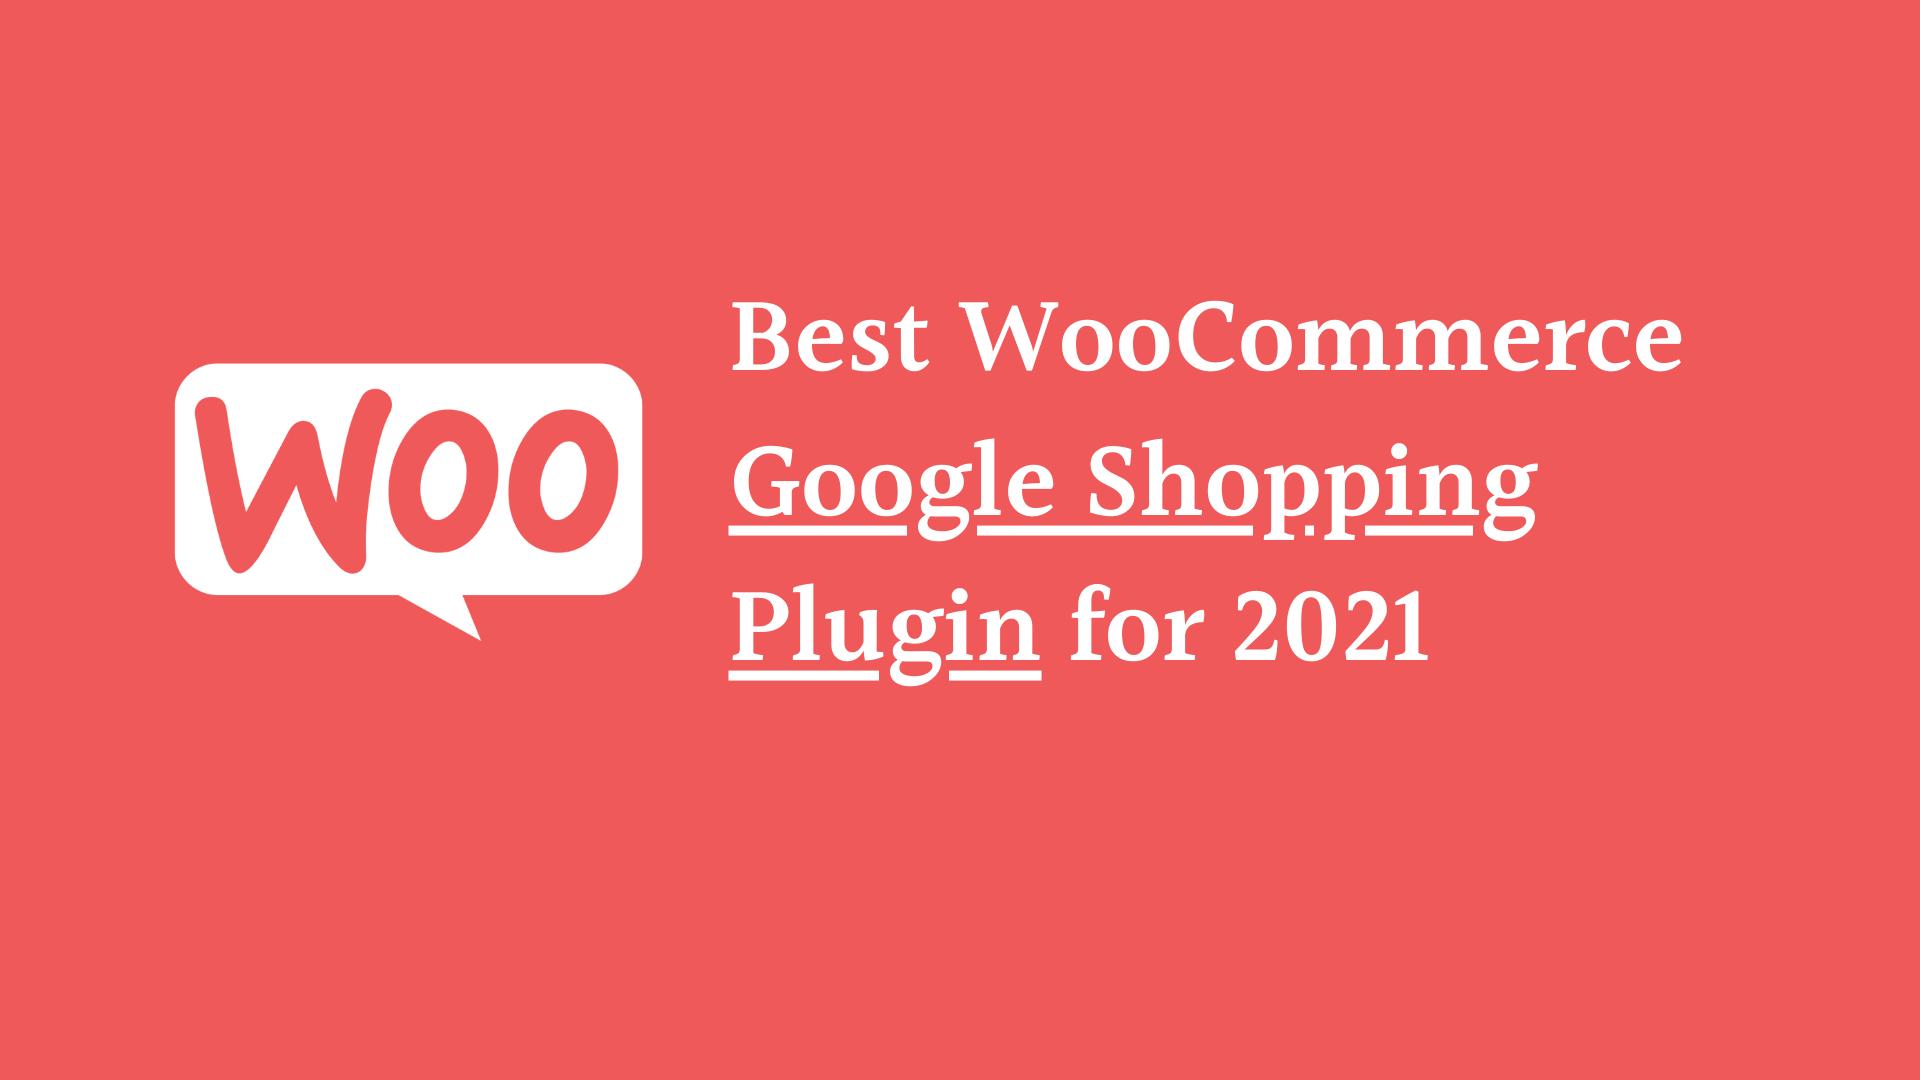 Best WooCommerce Google Shopping Plugin for 2021